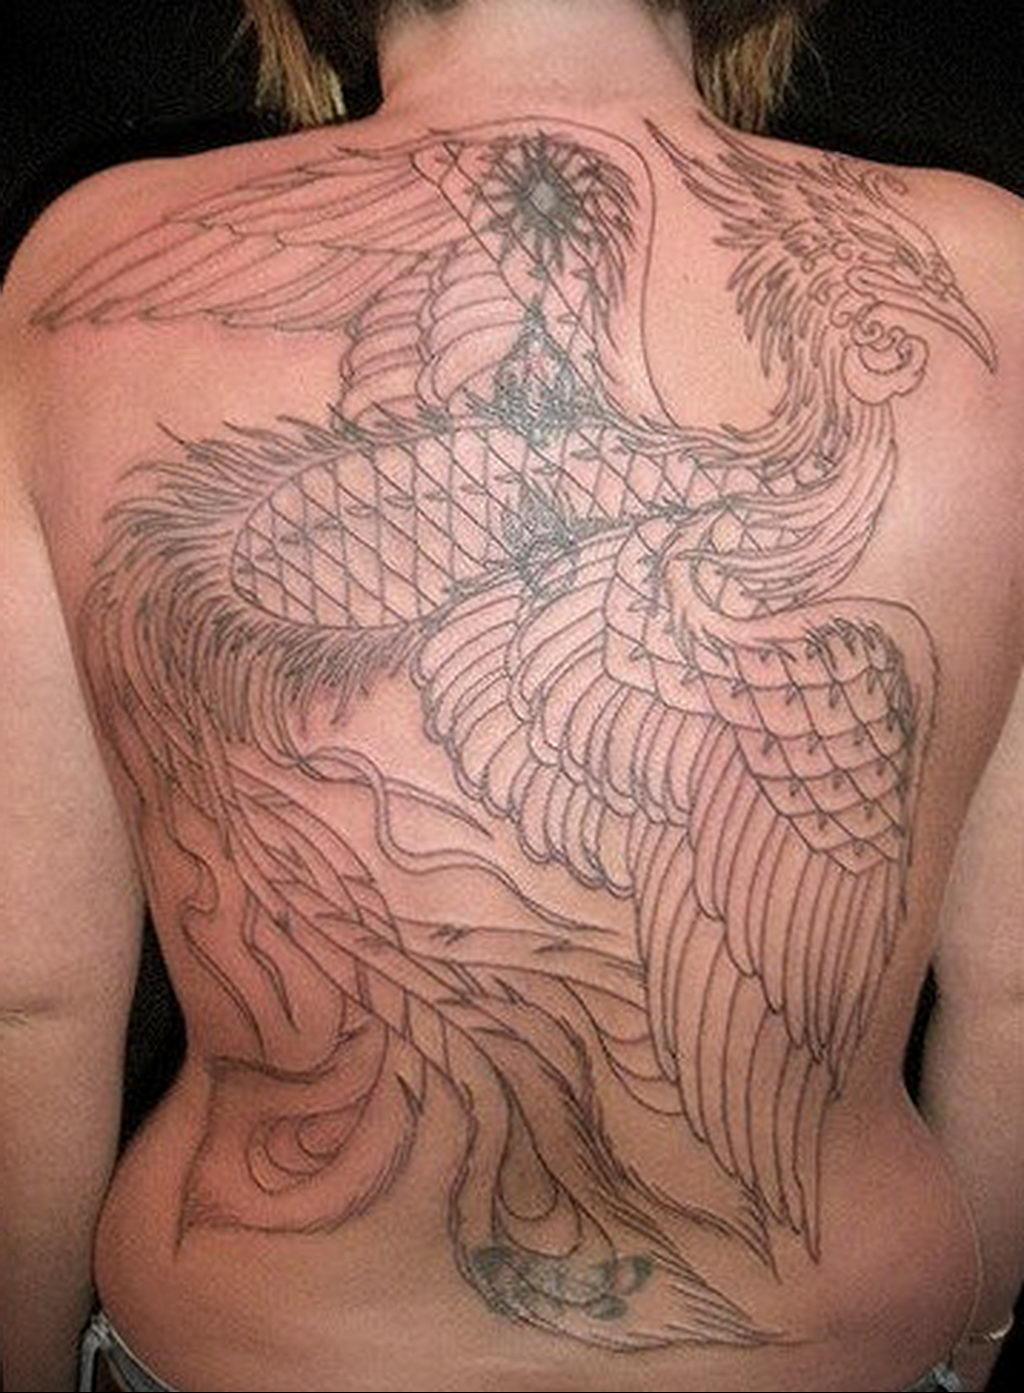 Фото тату про любовь рисунок Птица 03.02.2020 №333 -bird tattoo- tatufoto.com